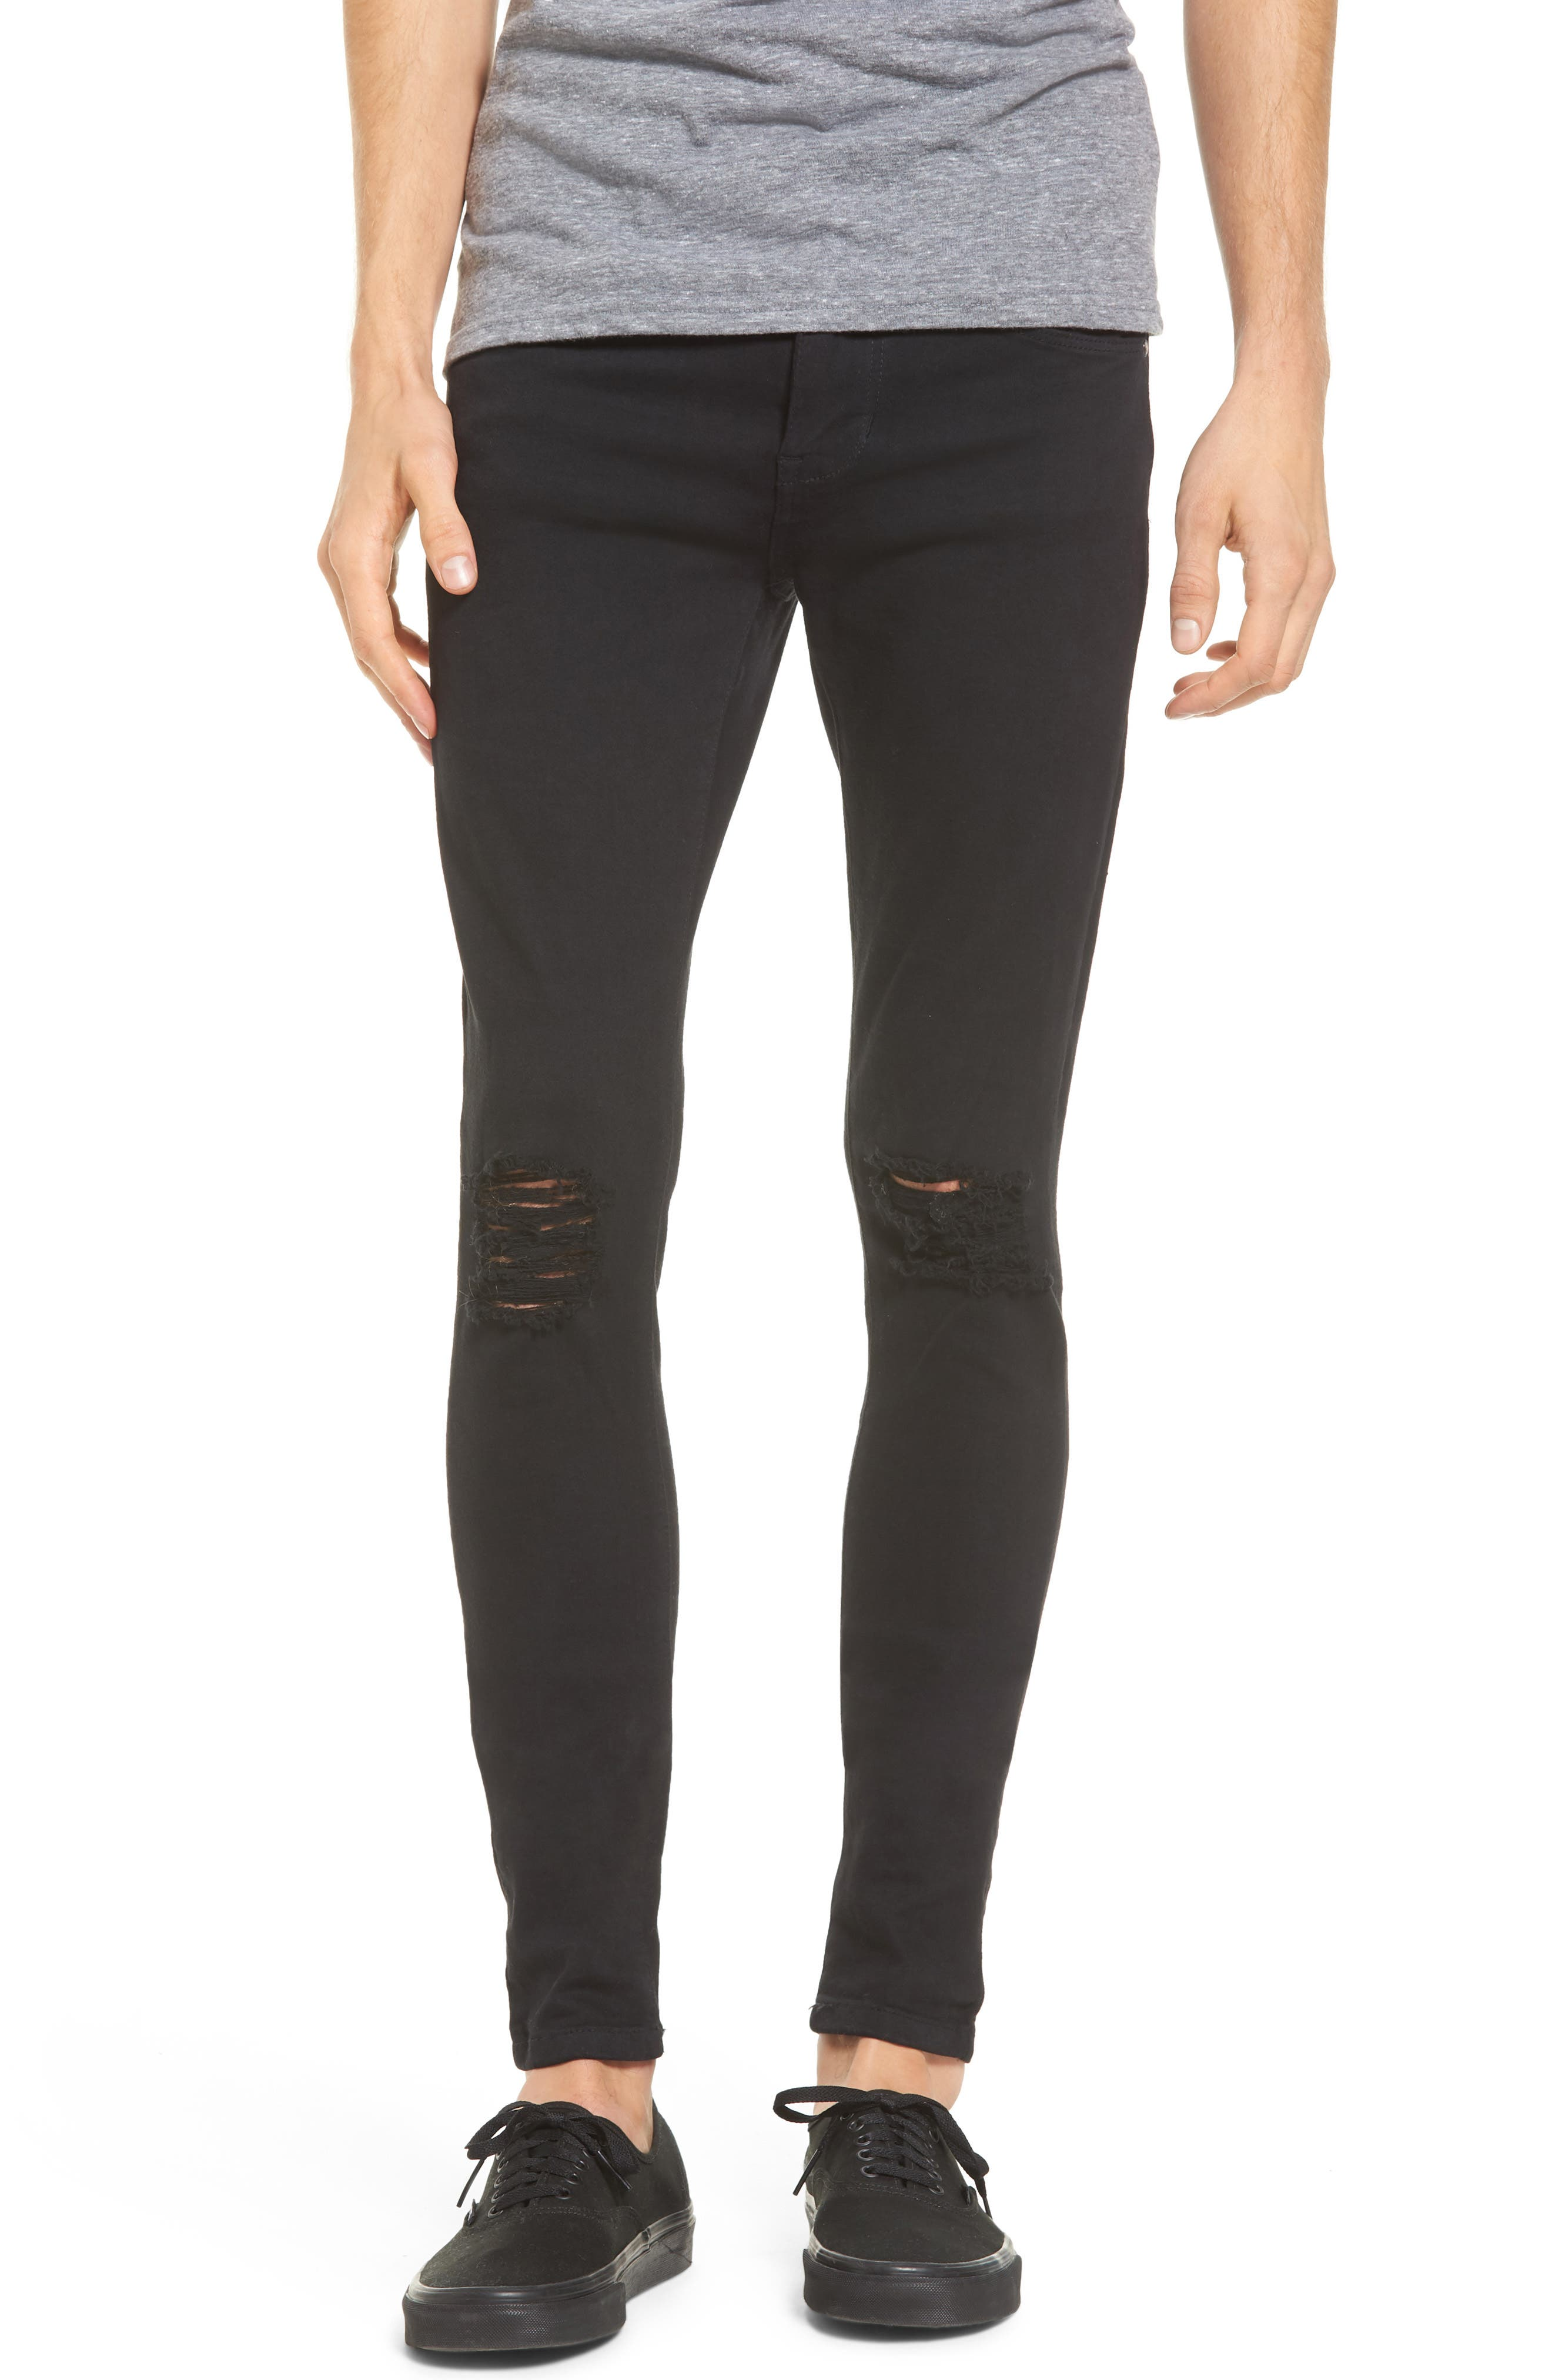 Main Image - Dr. Denim Supply Co. Leroy Slim Fit Jeans (Black Ripped Knees)